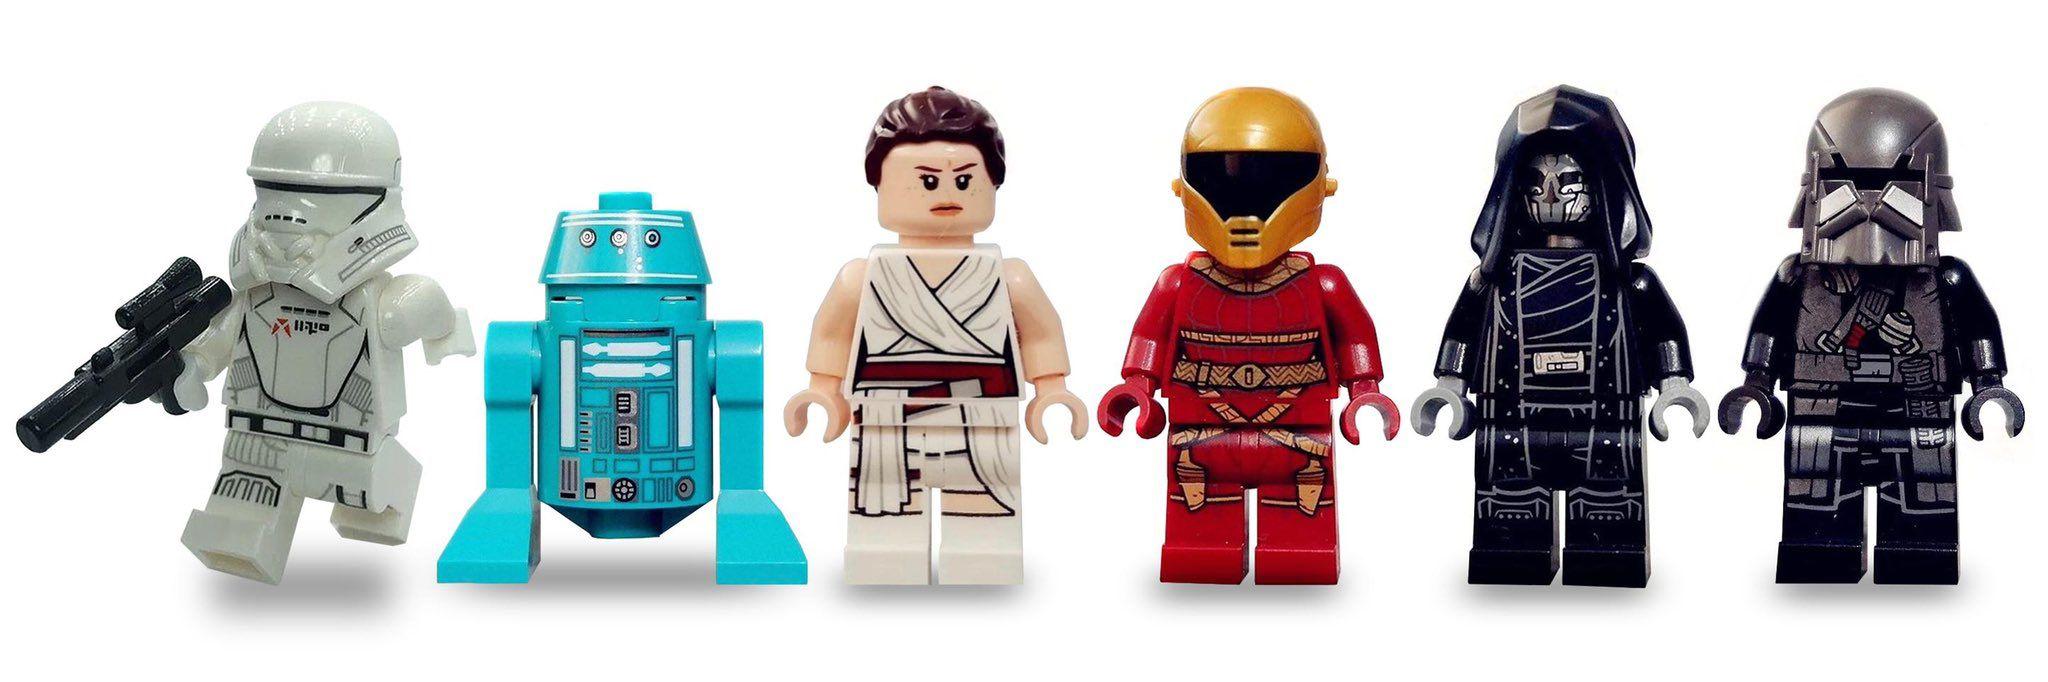 The Rise Of Skywalker Lego Star Wars Episodes Lego Star Wars